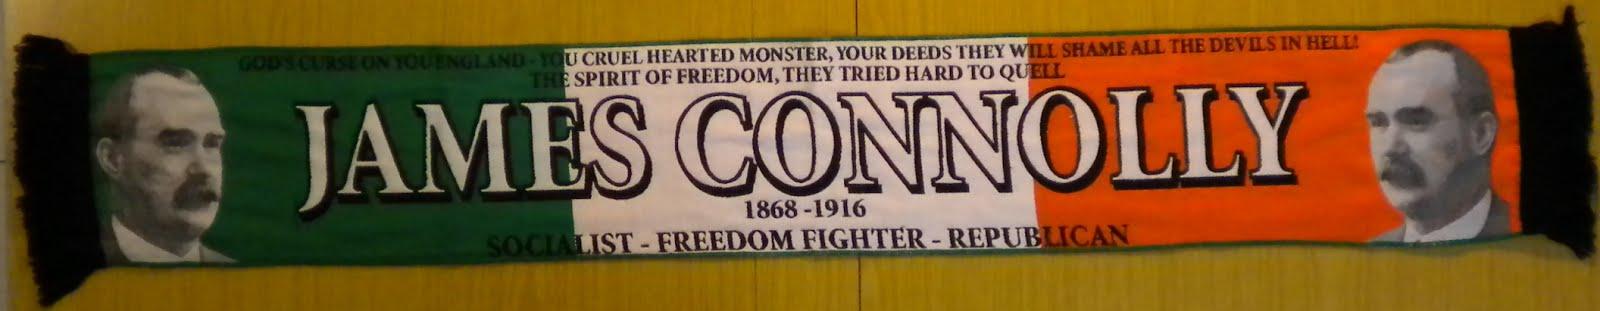 Bufanda 'James Connolly' - 15€